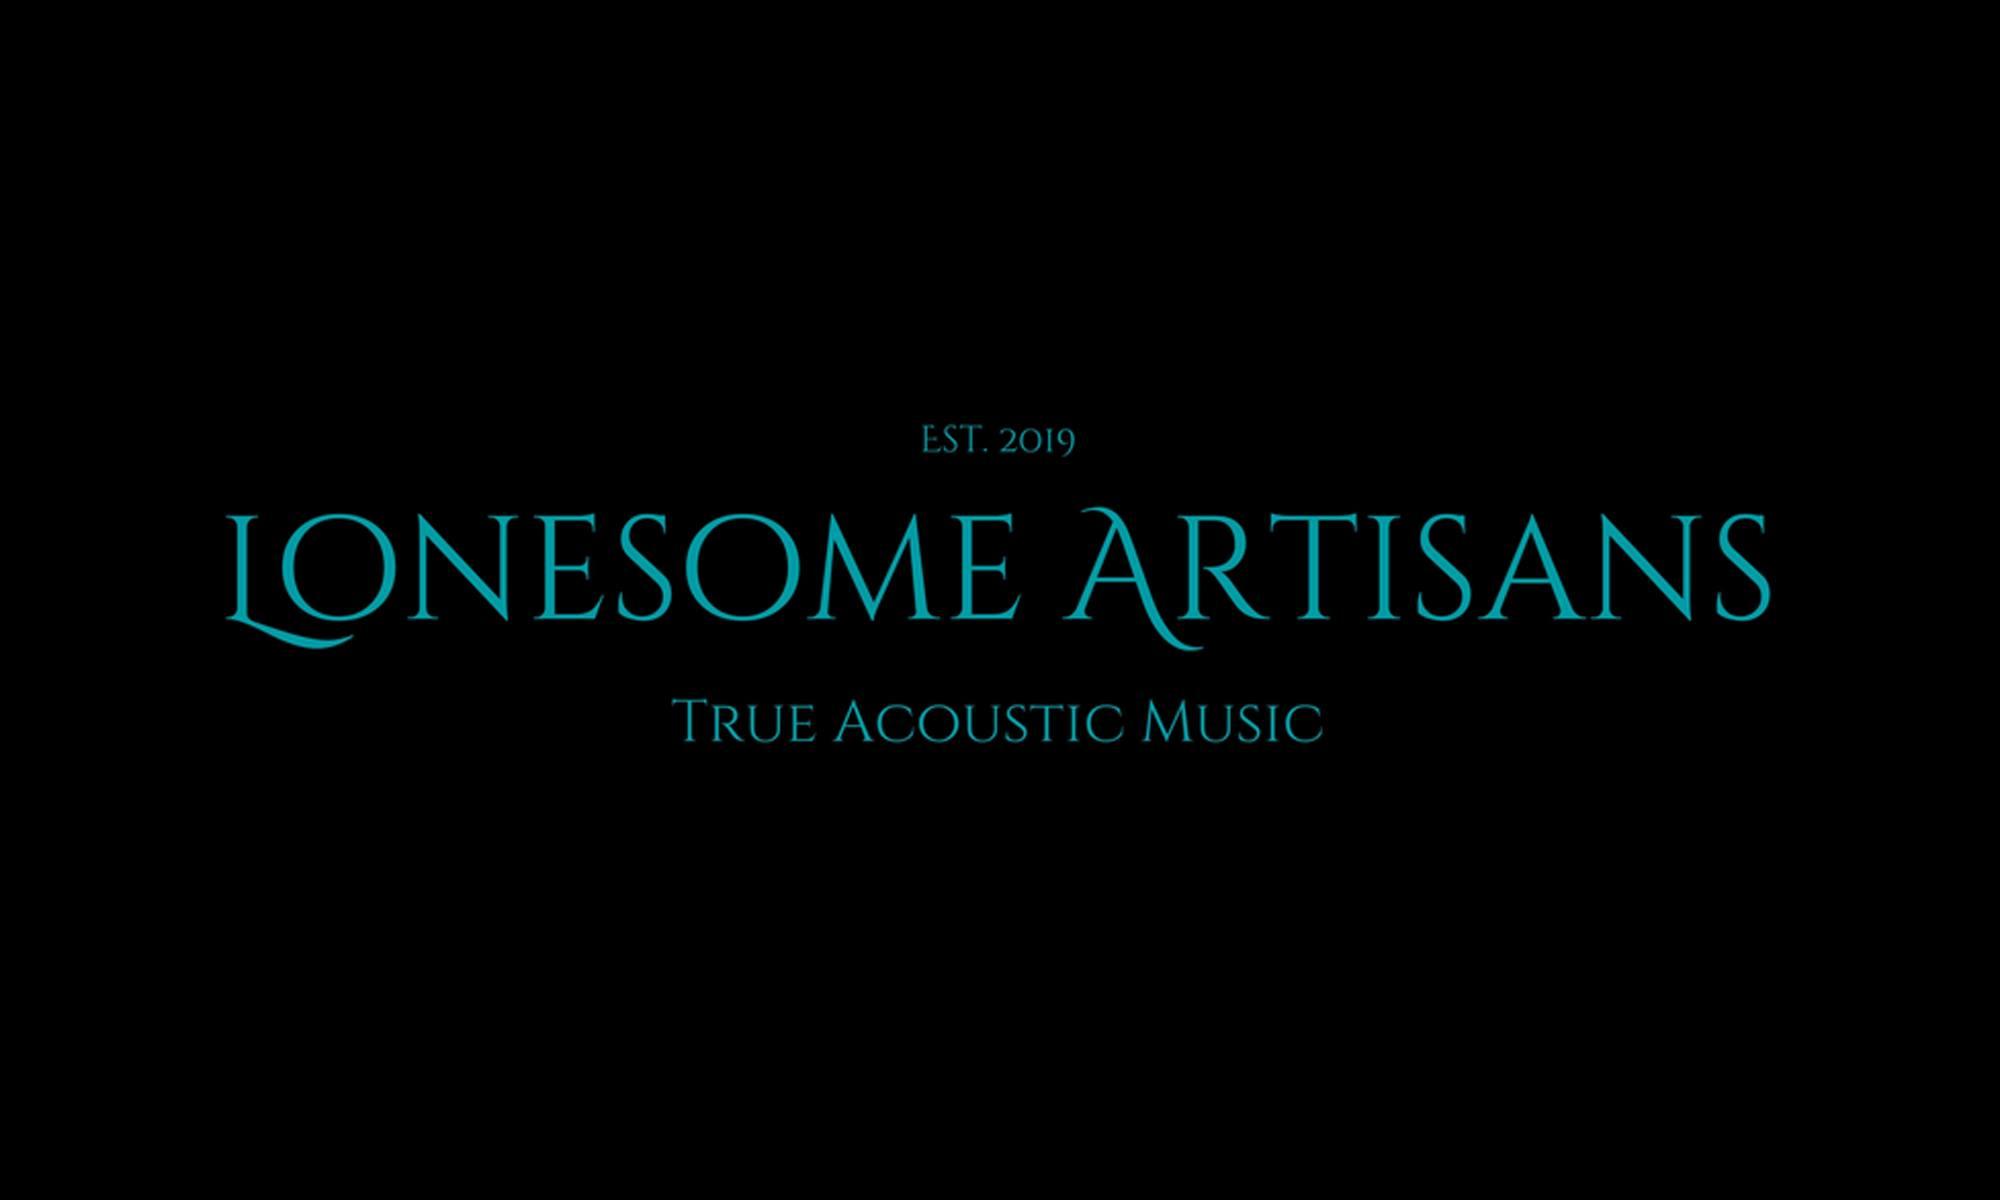 Lonesome artisans concert teaser